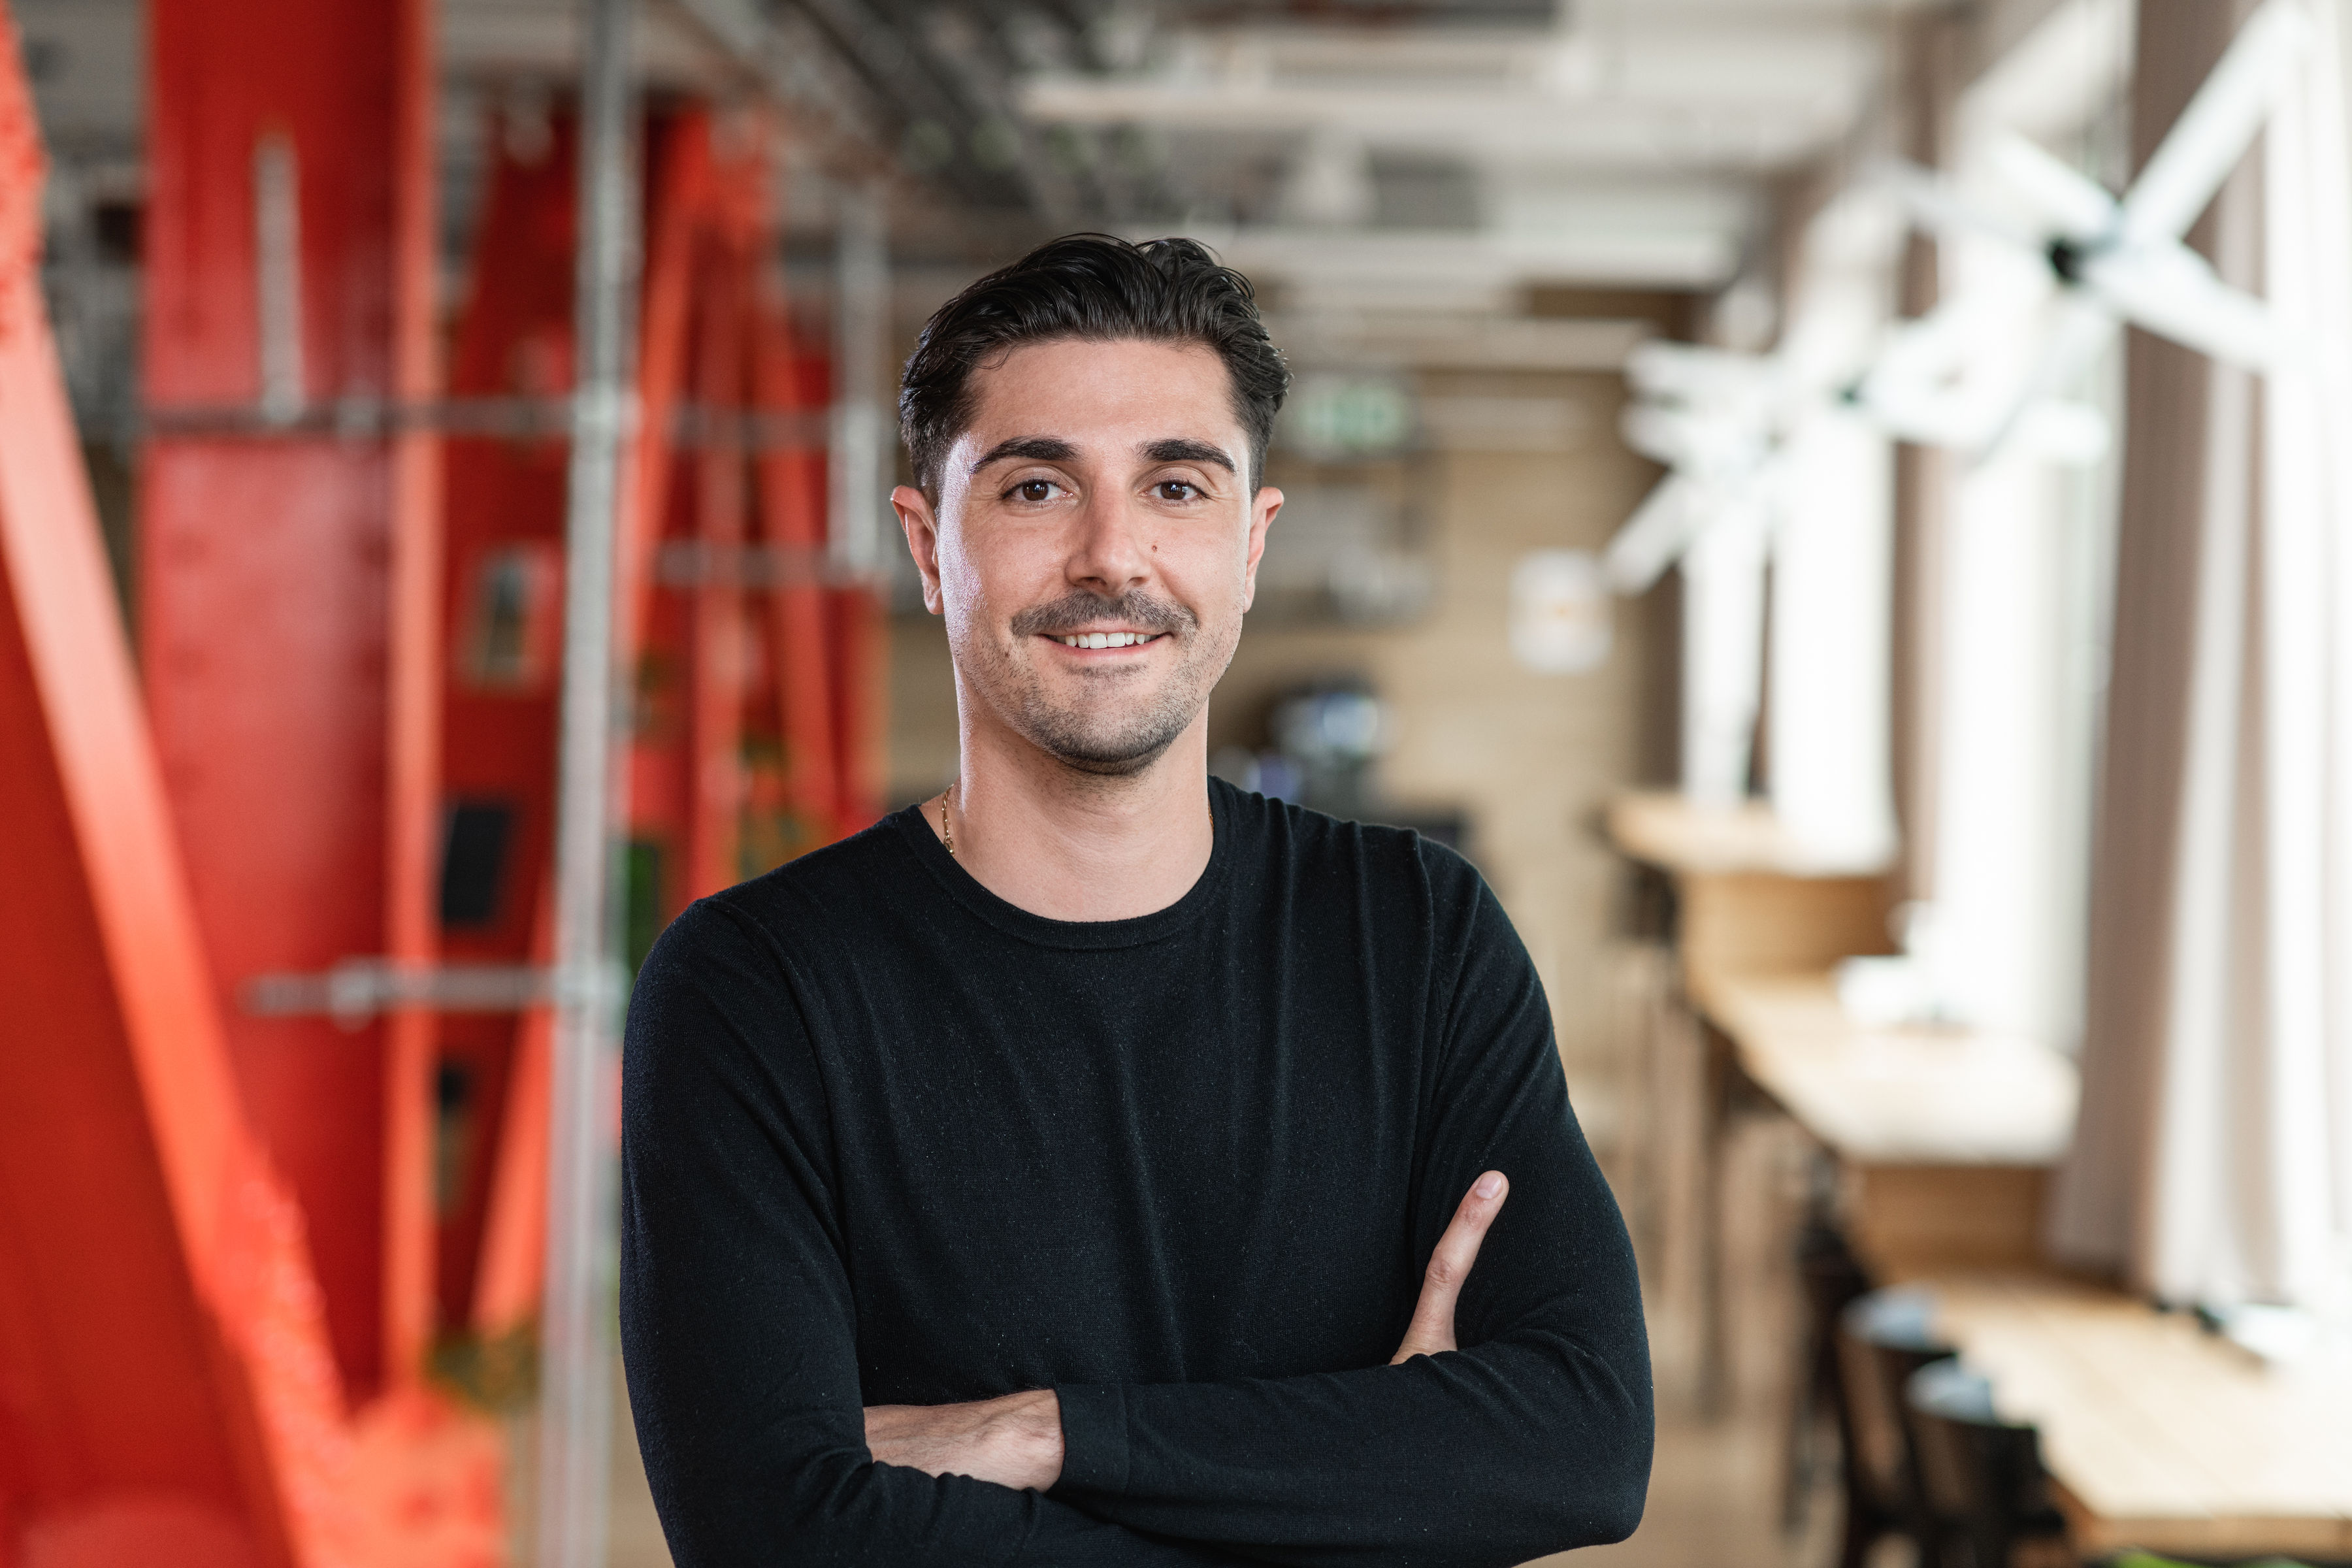 Dataddoer Spotlight: Gabriel Chooses the Expat Life